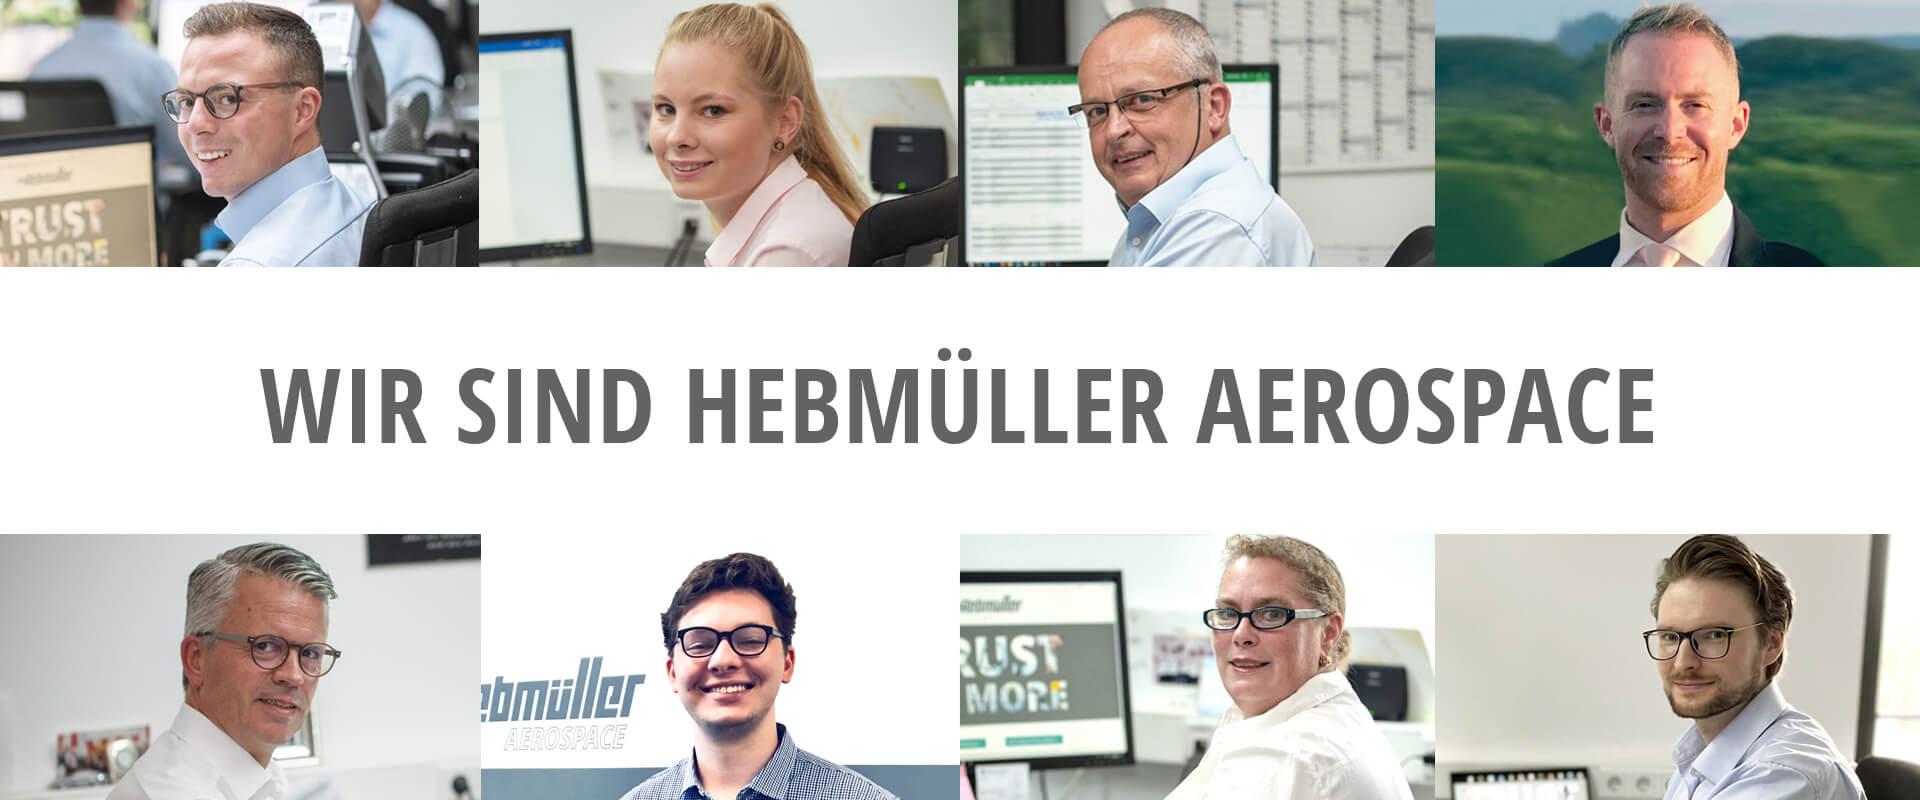 We are Hebmüller Aerospace